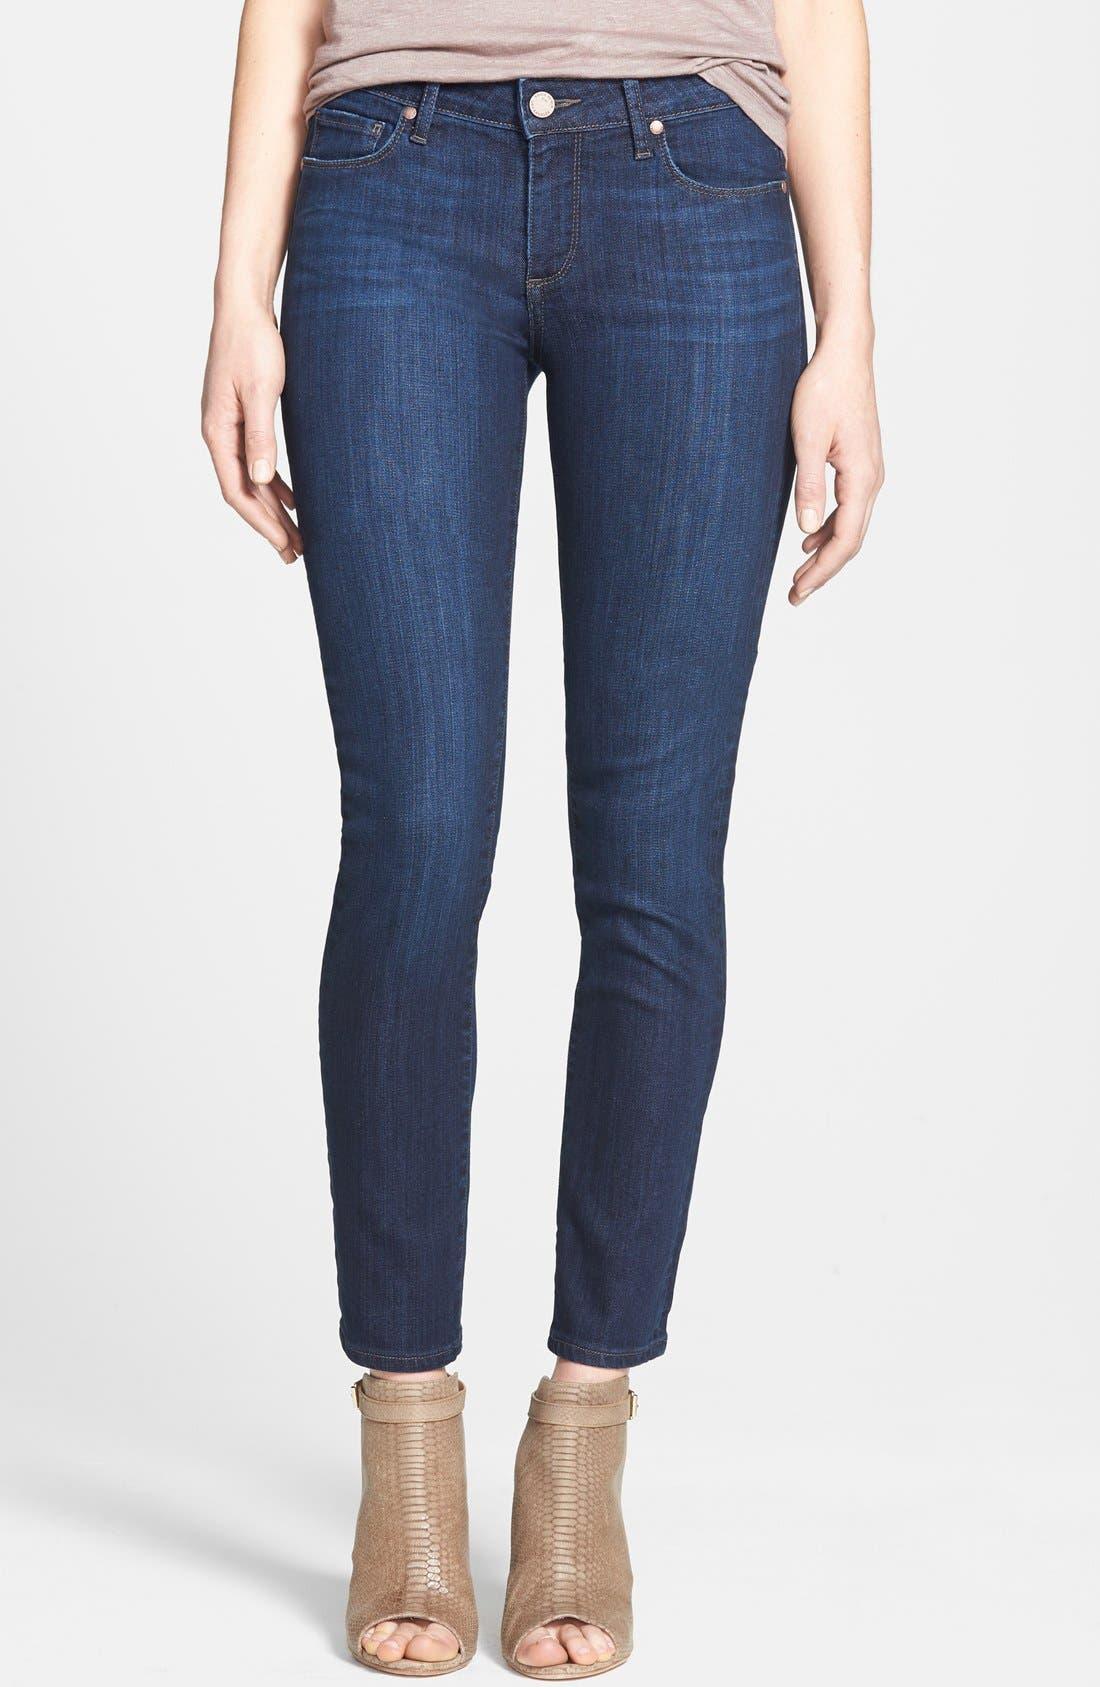 Alternate Image 1 Selected - Paige Denim 'Skyline' Ankle Peg Skinny Jeans (Dixie) (Nordstrom Exclusive)